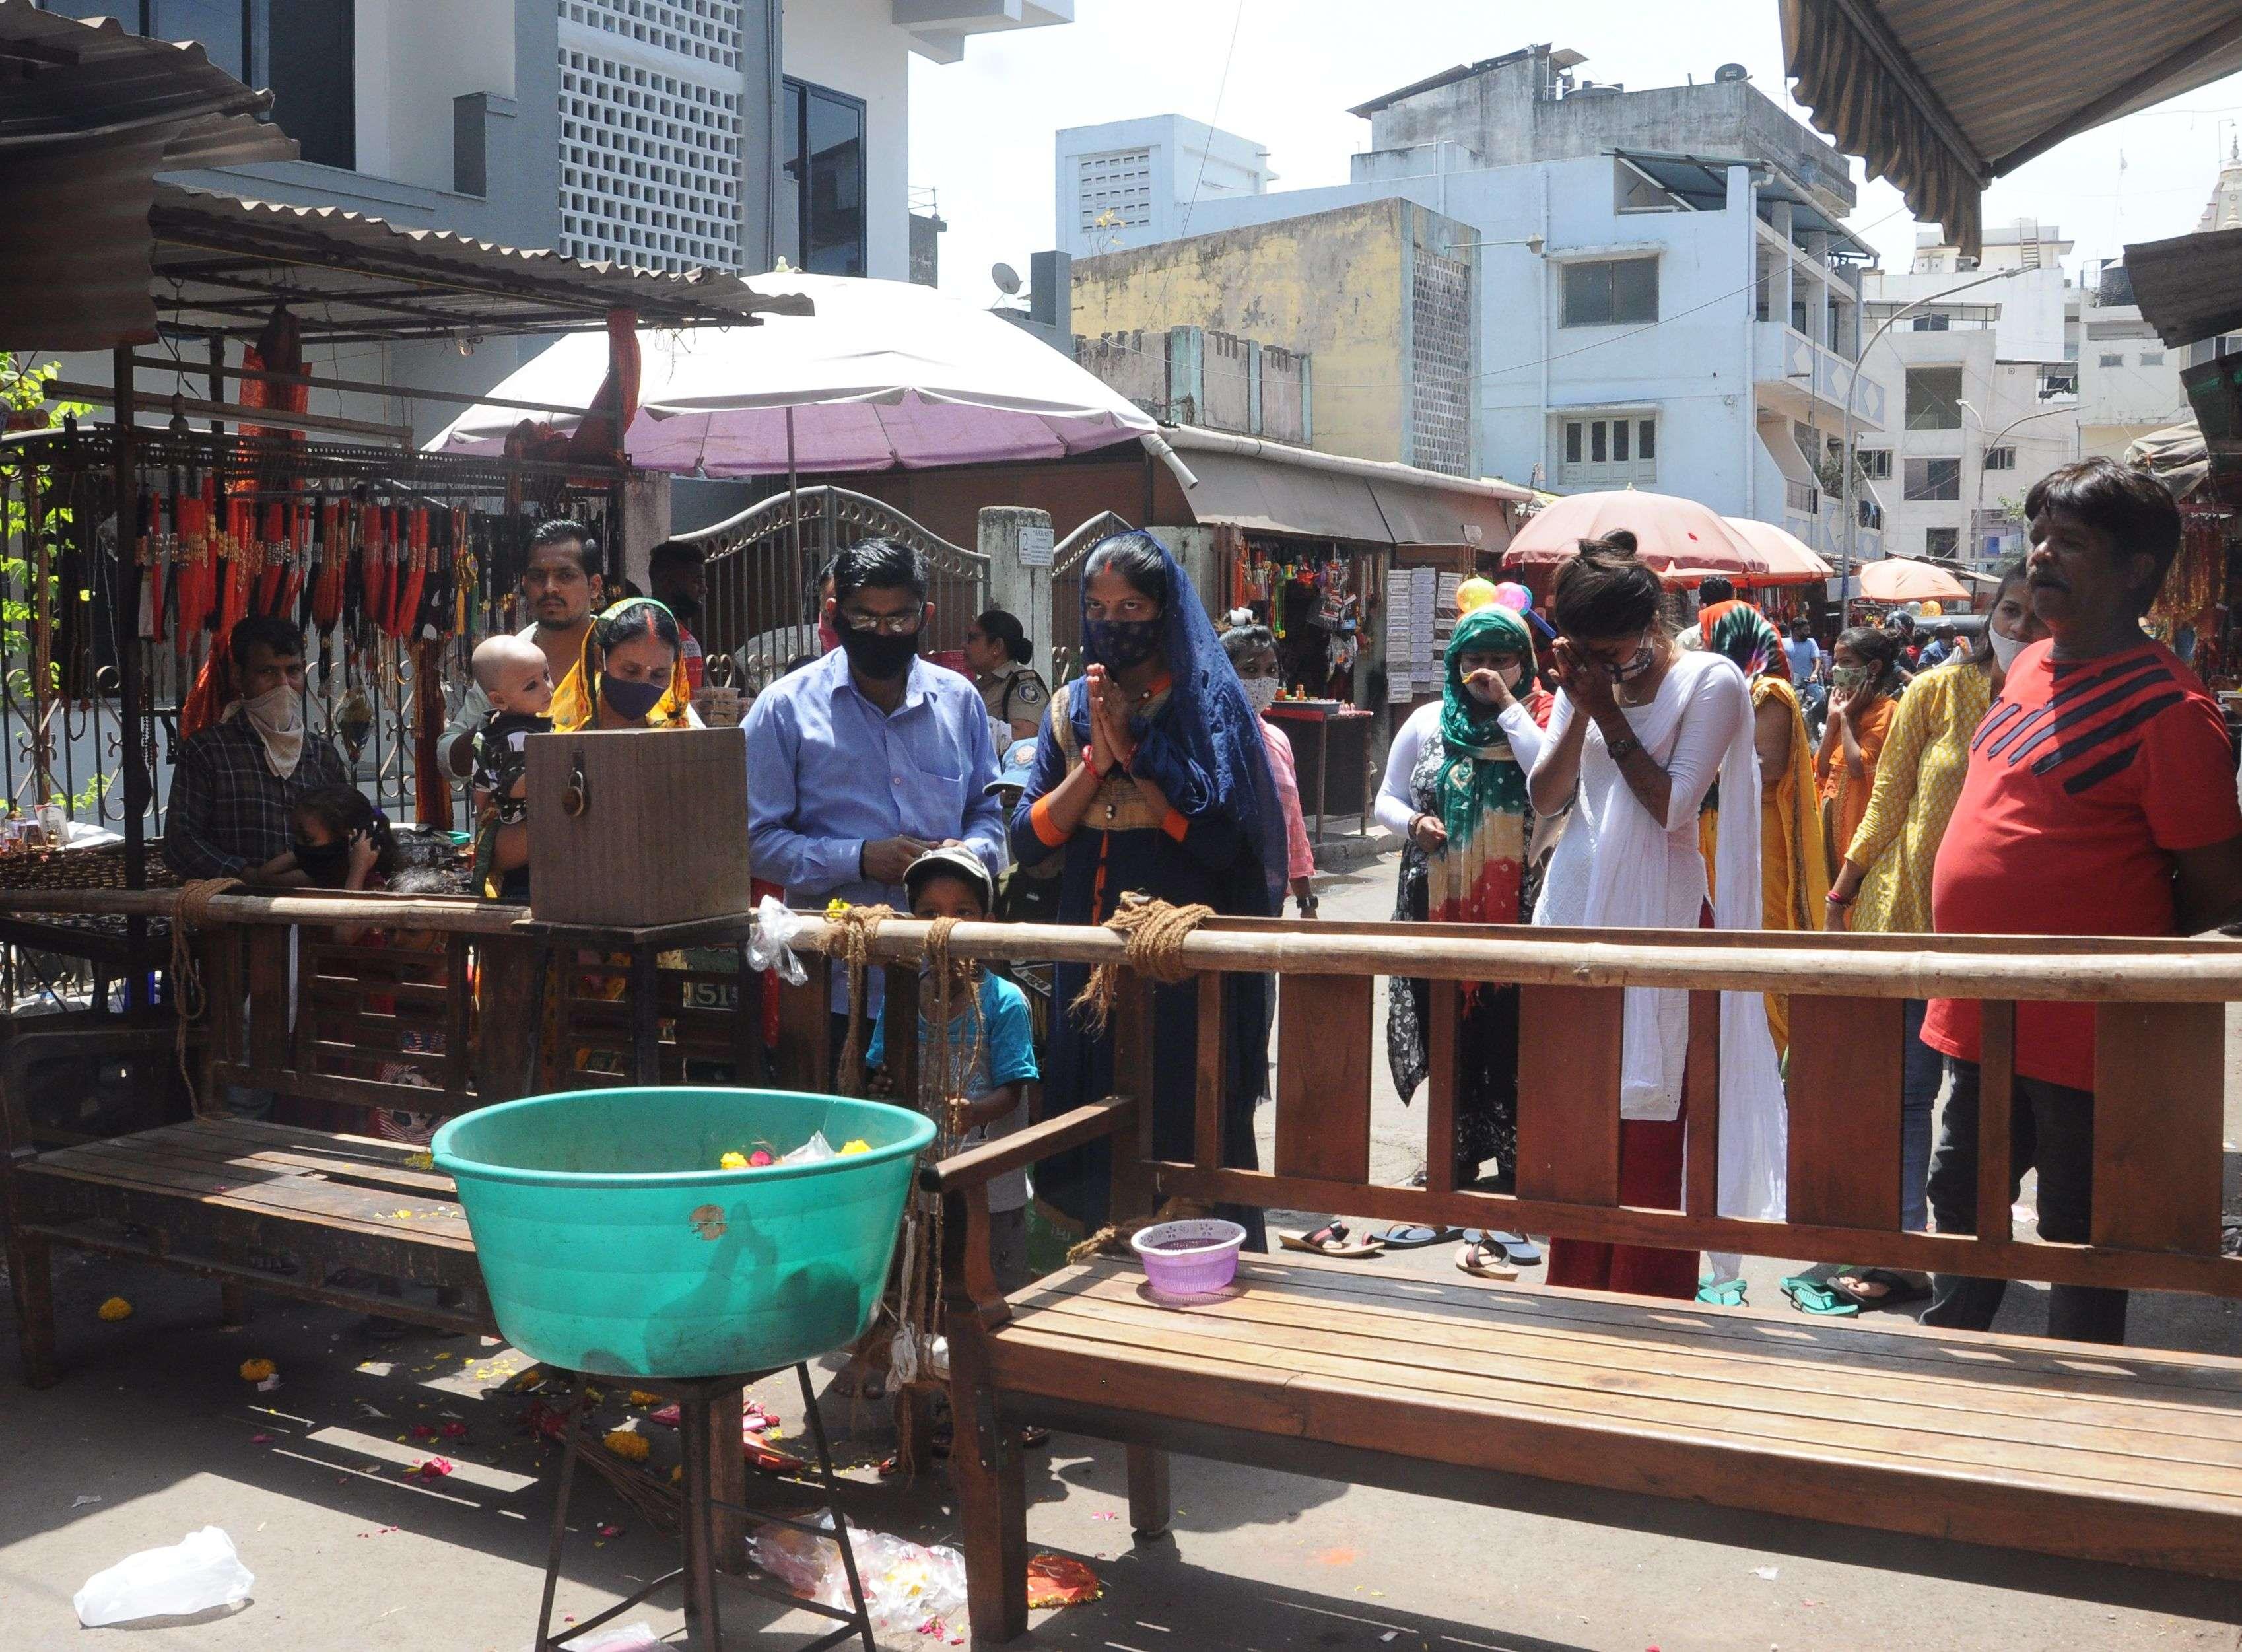 SURAT NEWS: पूर्णाहुति आज, मनाएंगे रामनवमी